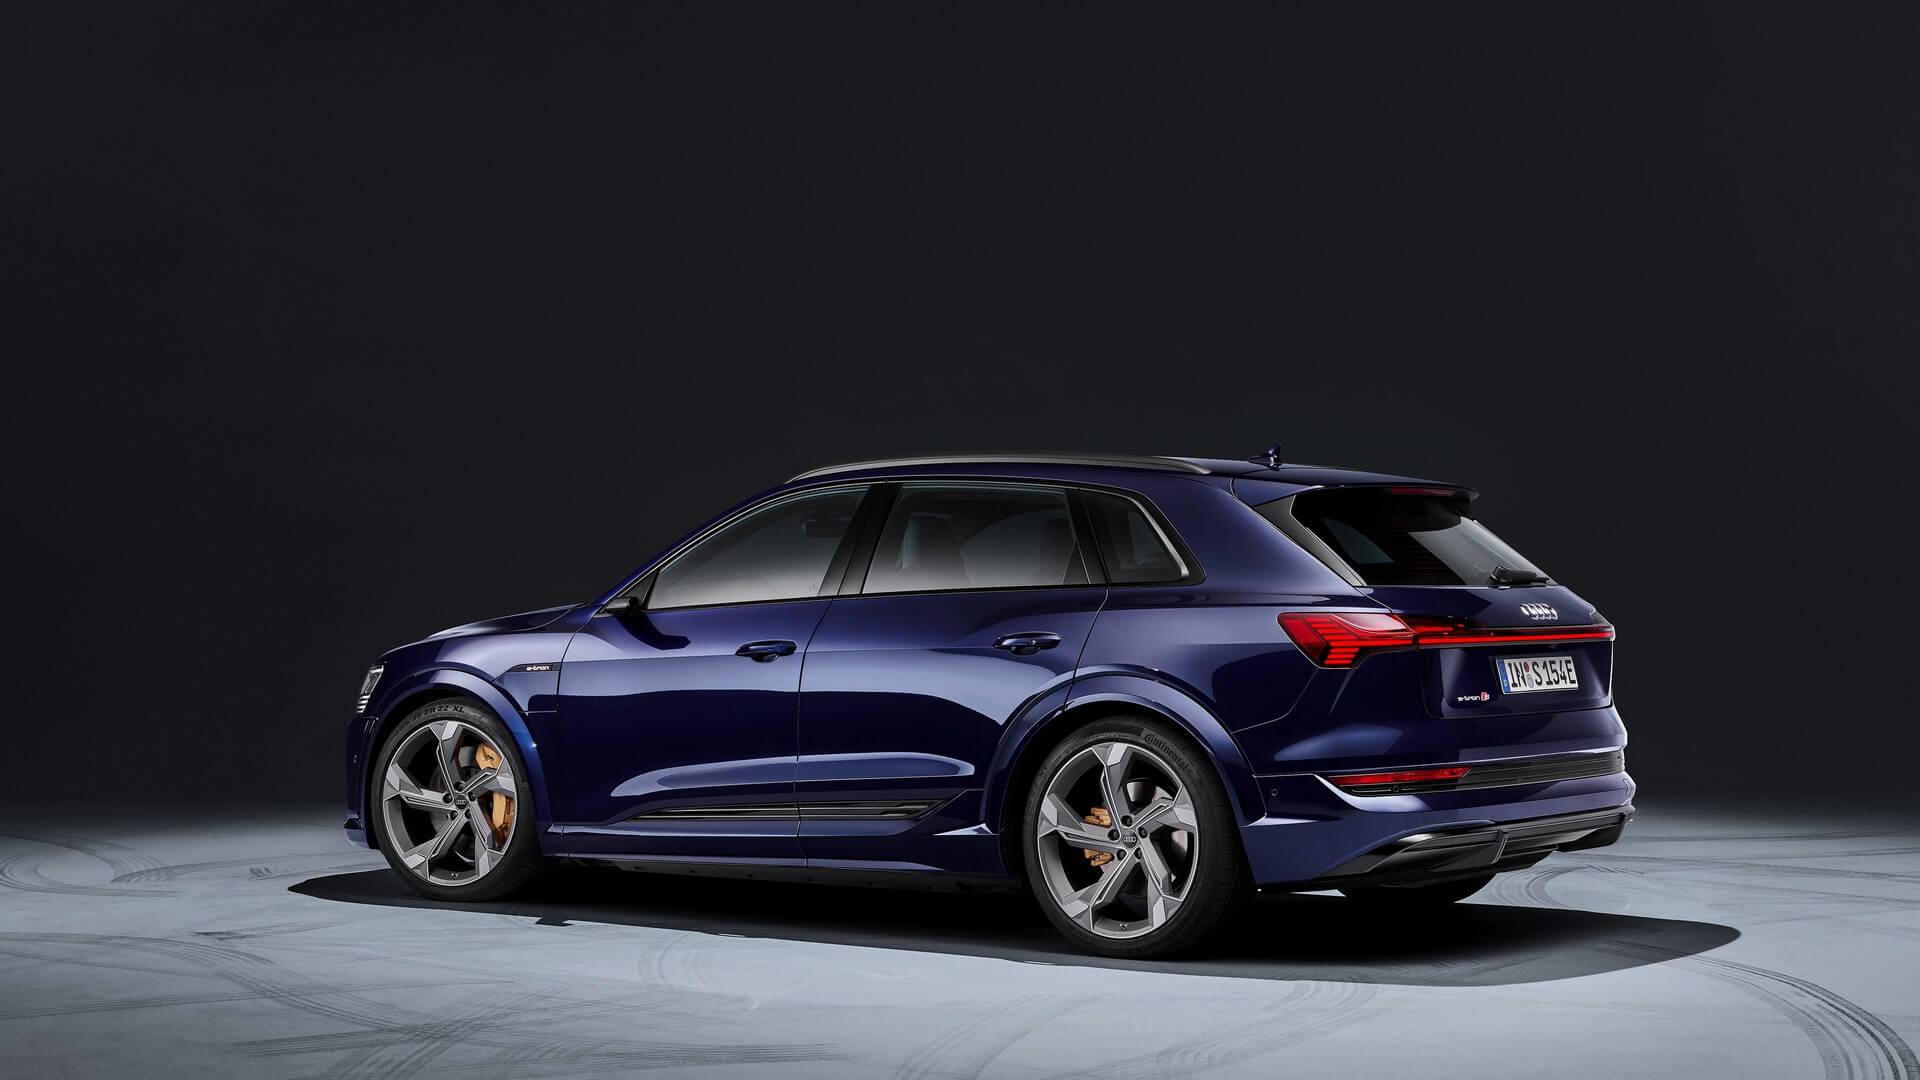 Audi-E-Tron-S-and-E-Tron-S-Sportback-2020-28